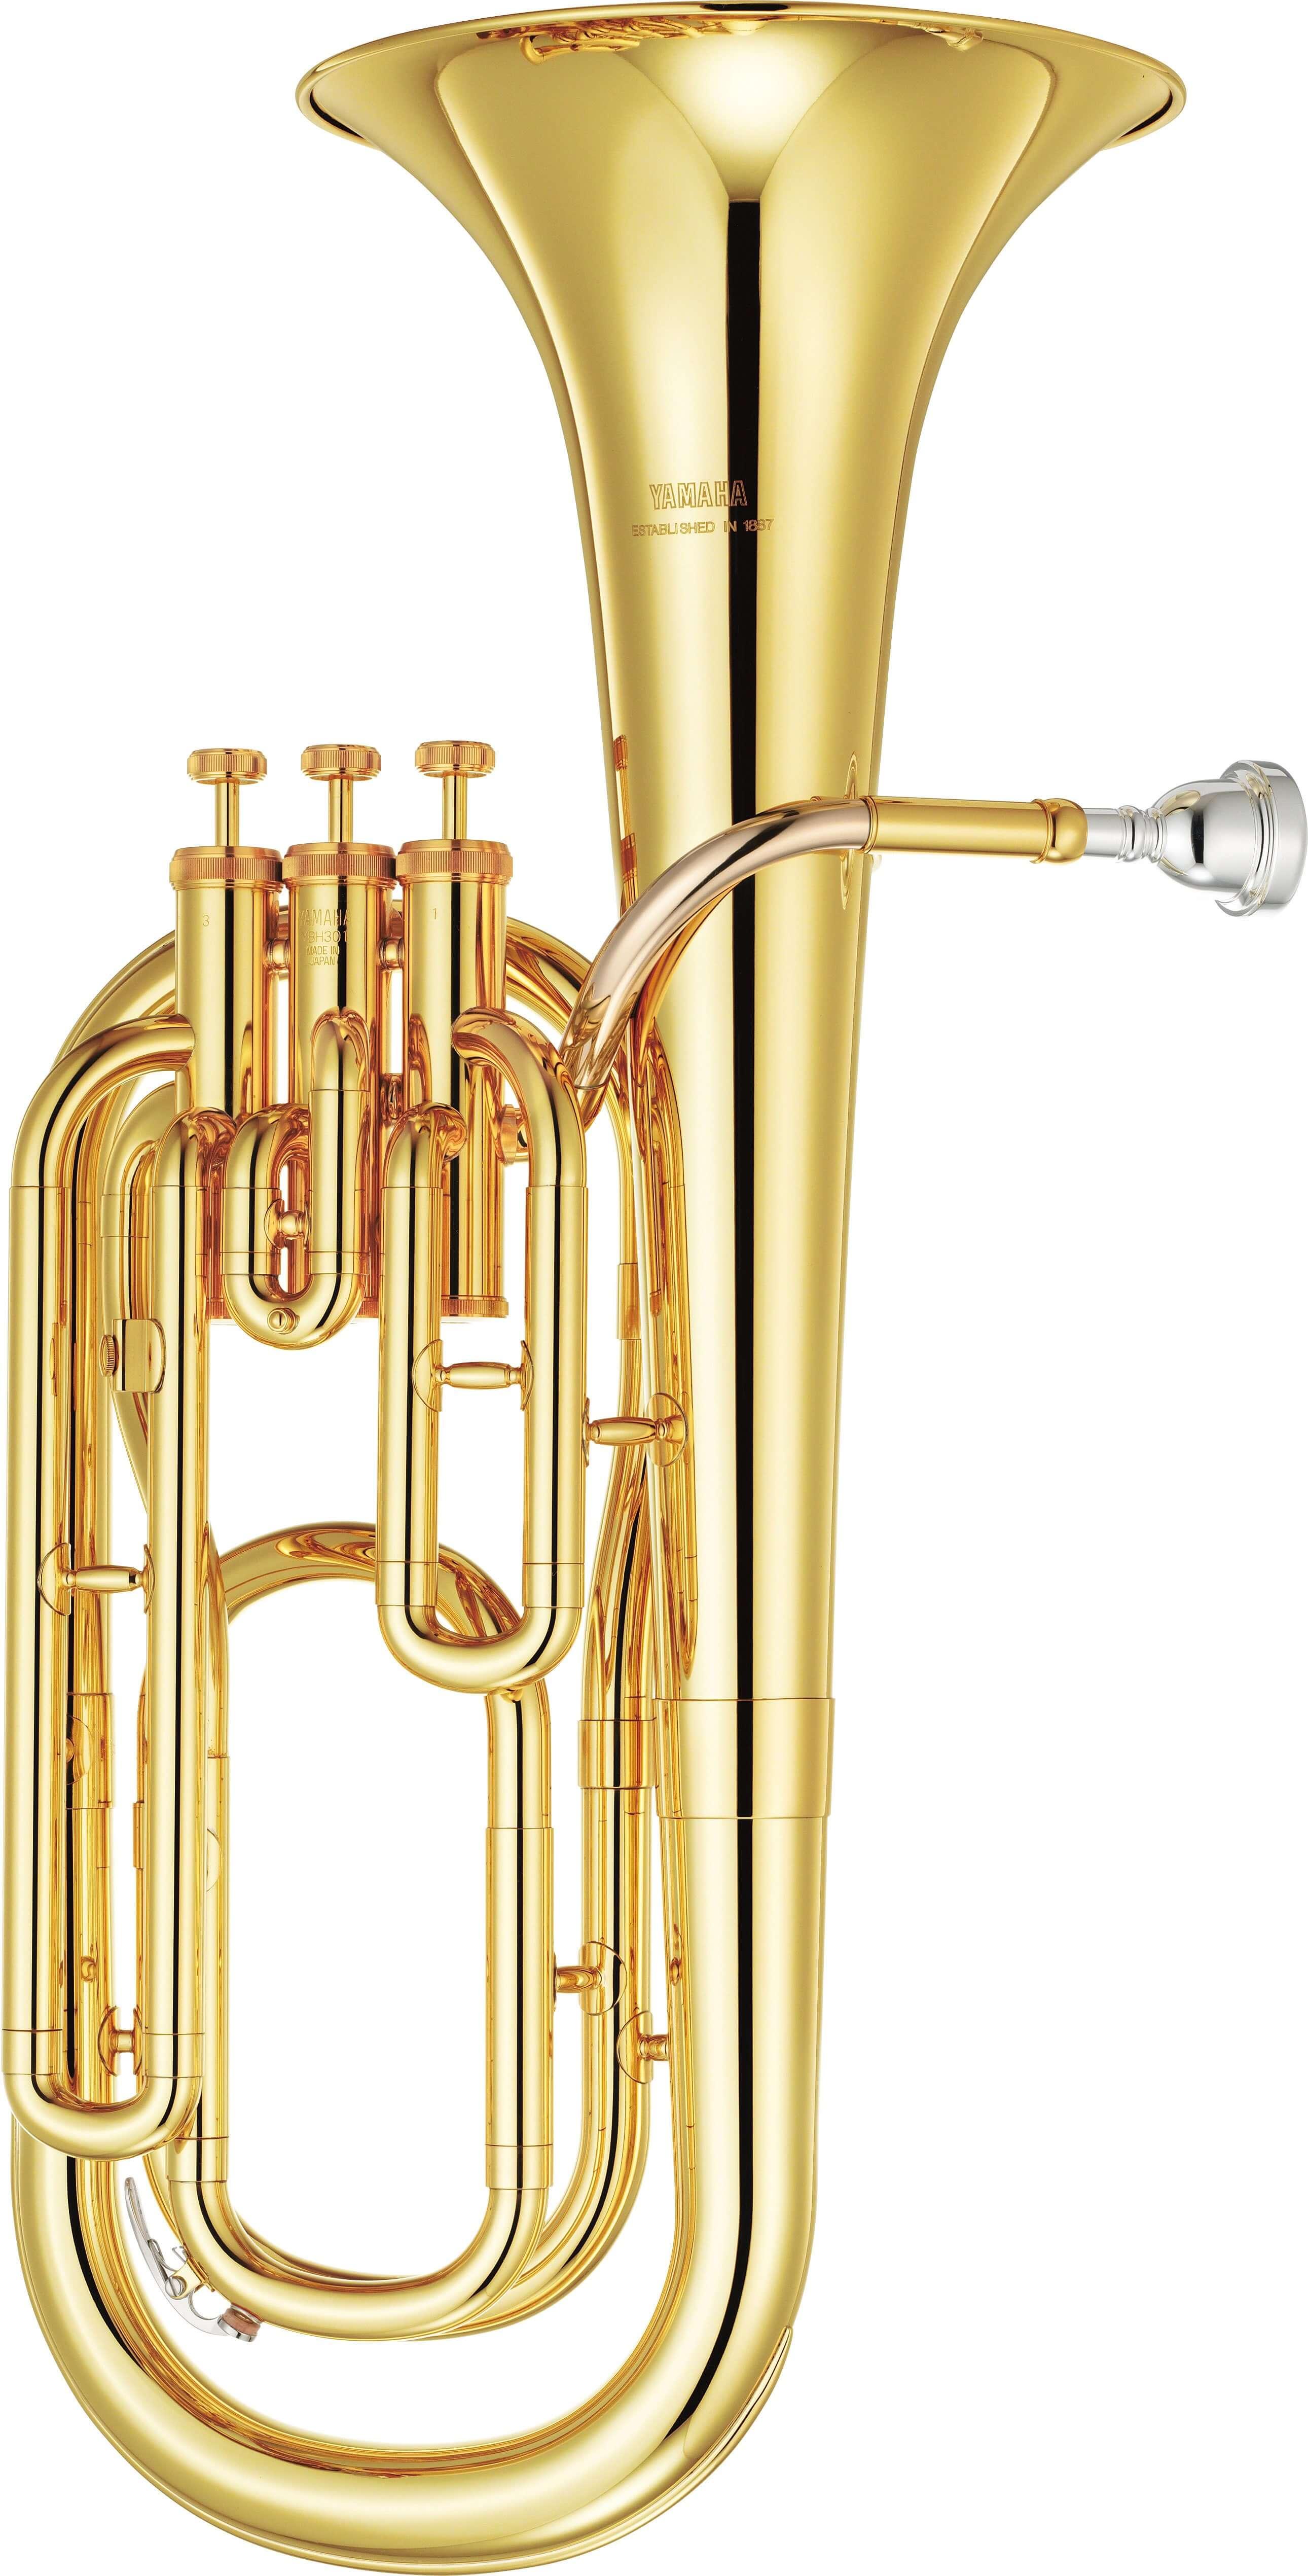 Baritono Yamaha Ybh-301